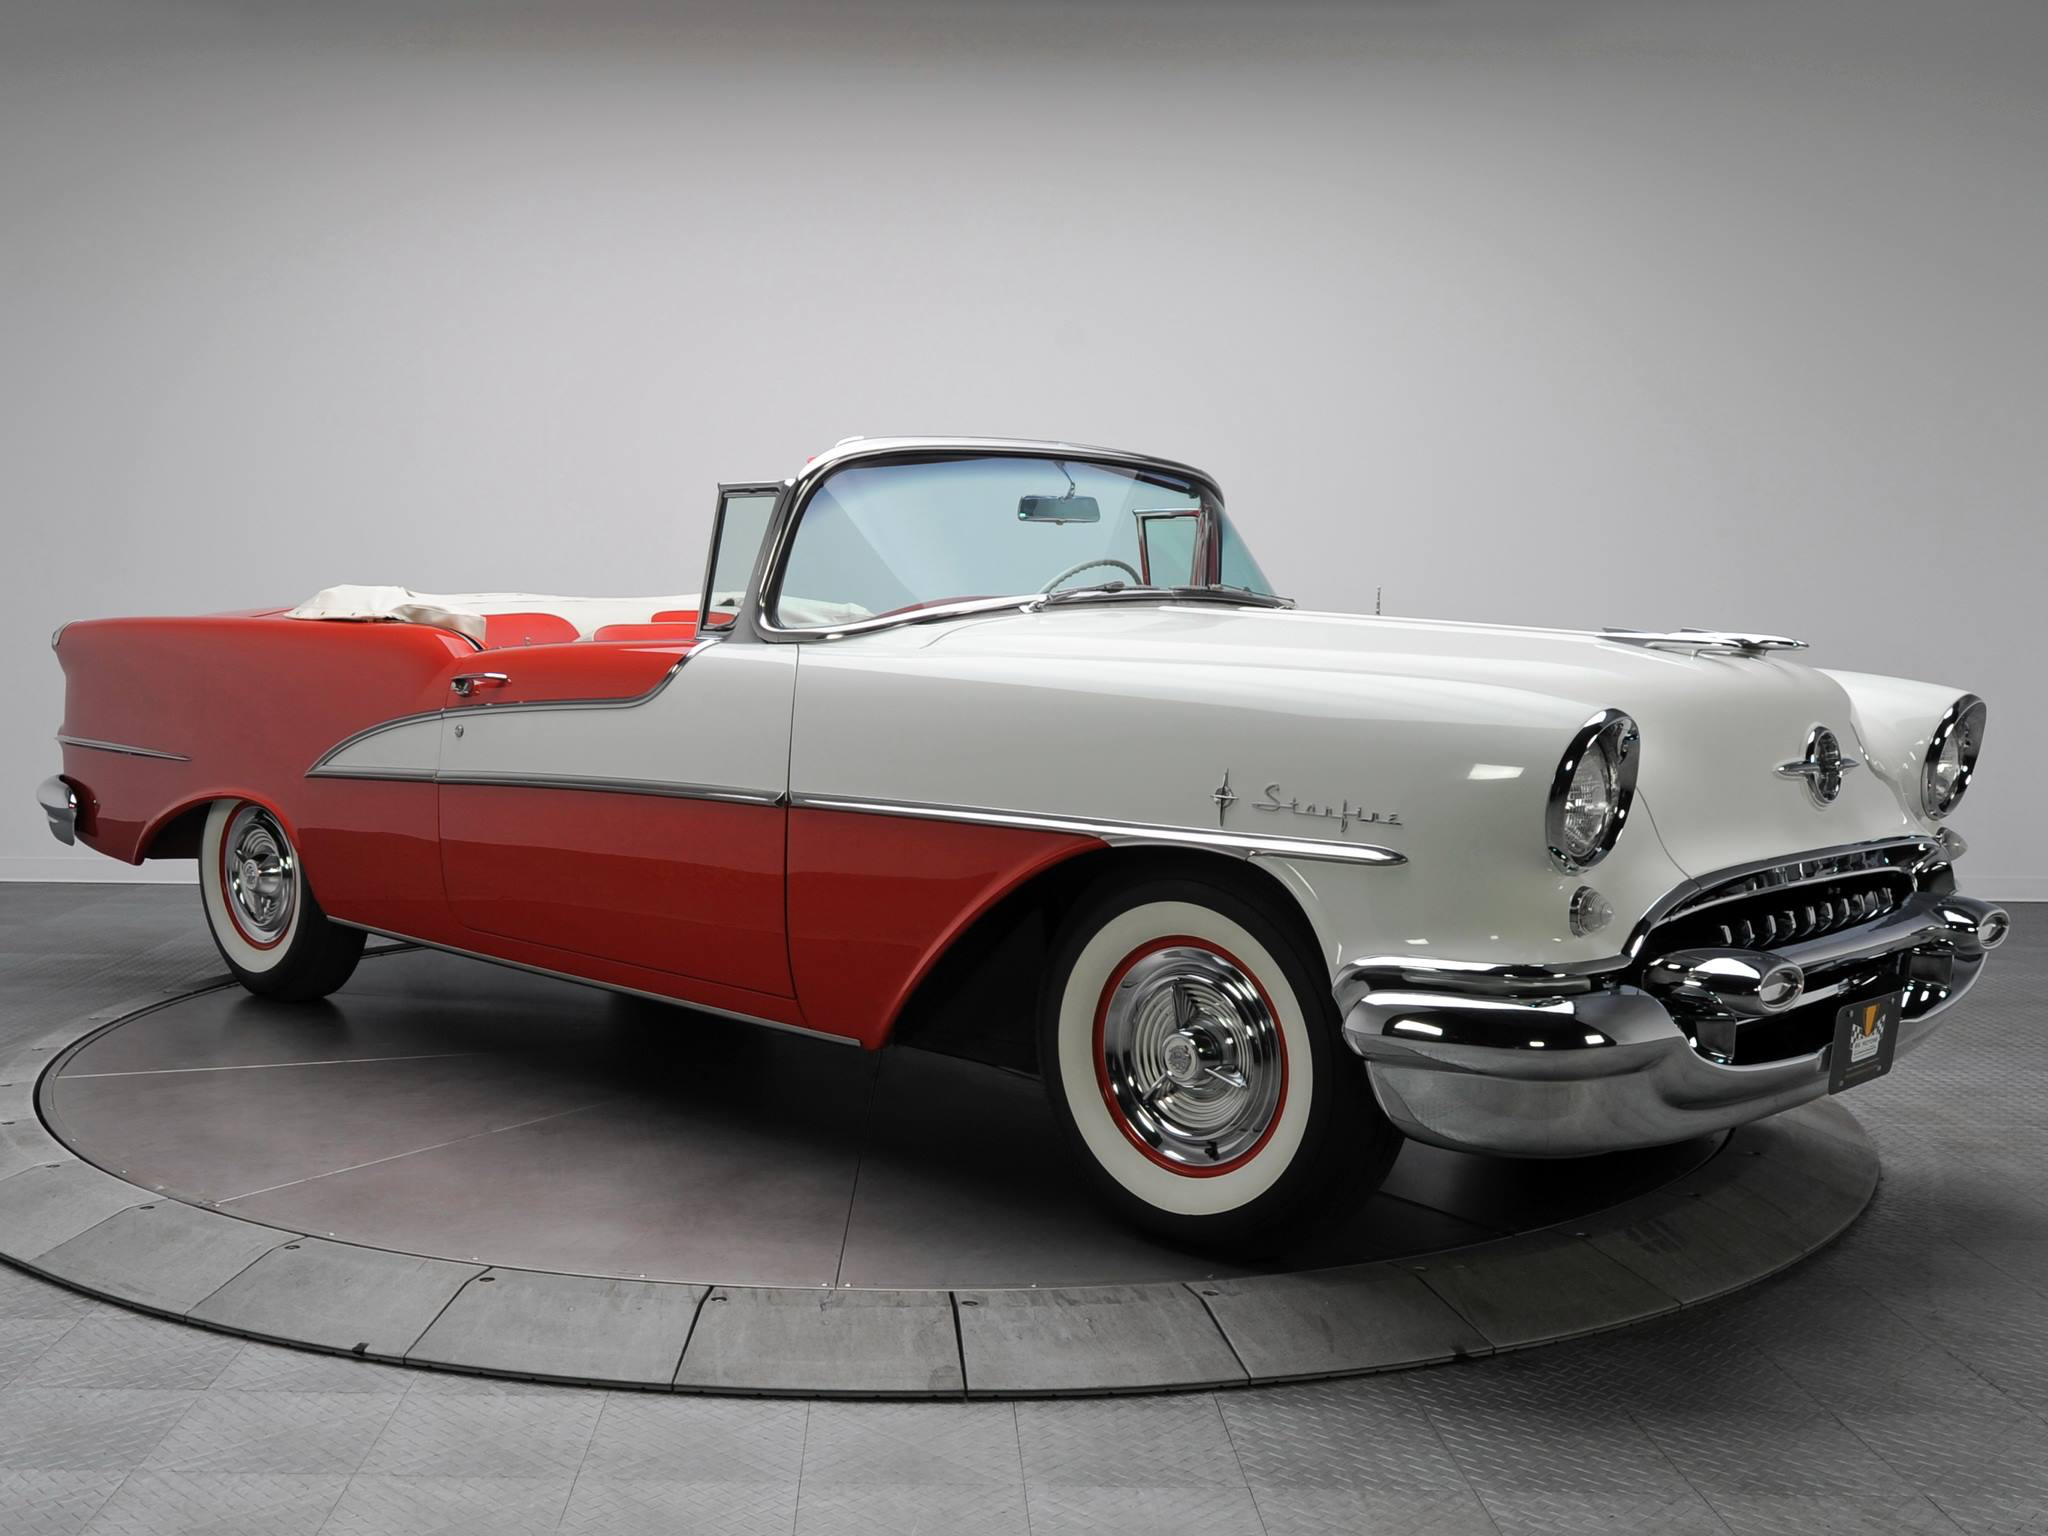 1955 Oldsmobile 98 Starfire convertible | Classic Autos | Pinterest ...